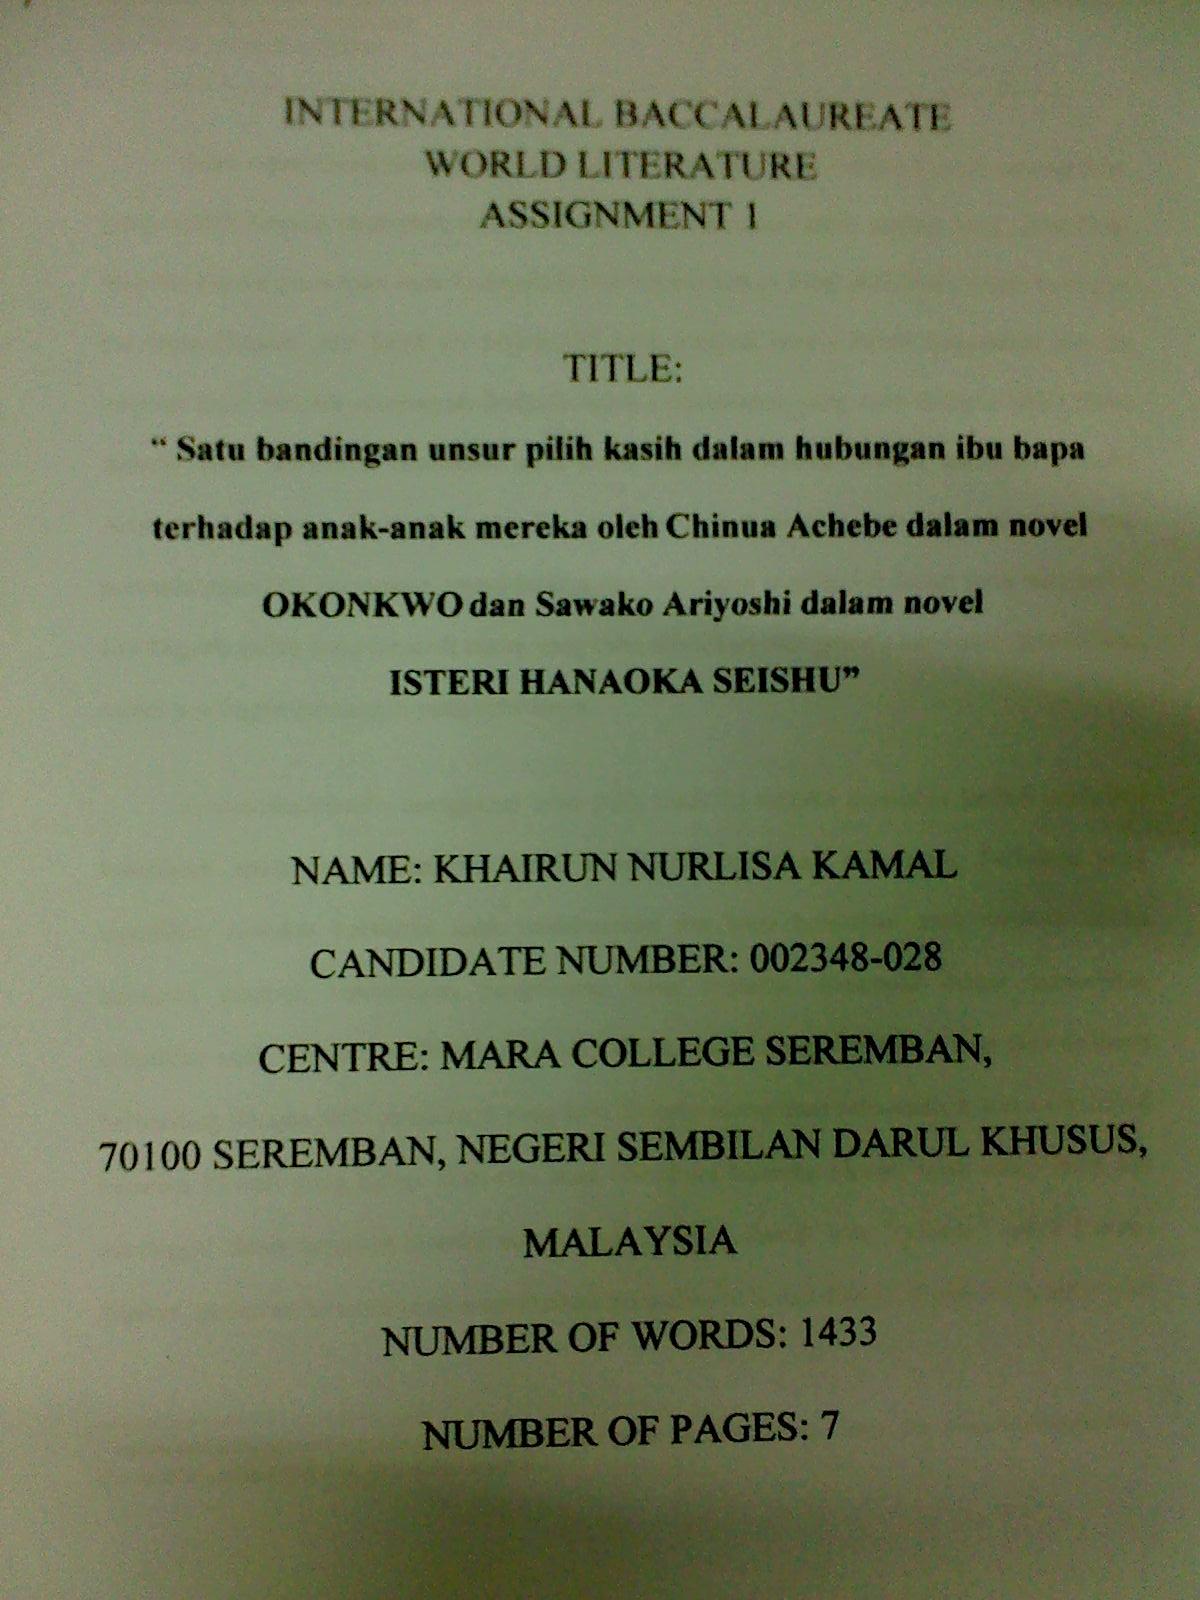 the tales of nurlisa kamal malay a sl world literature essay tak semua orang dapat remarks macam ni tau bangga